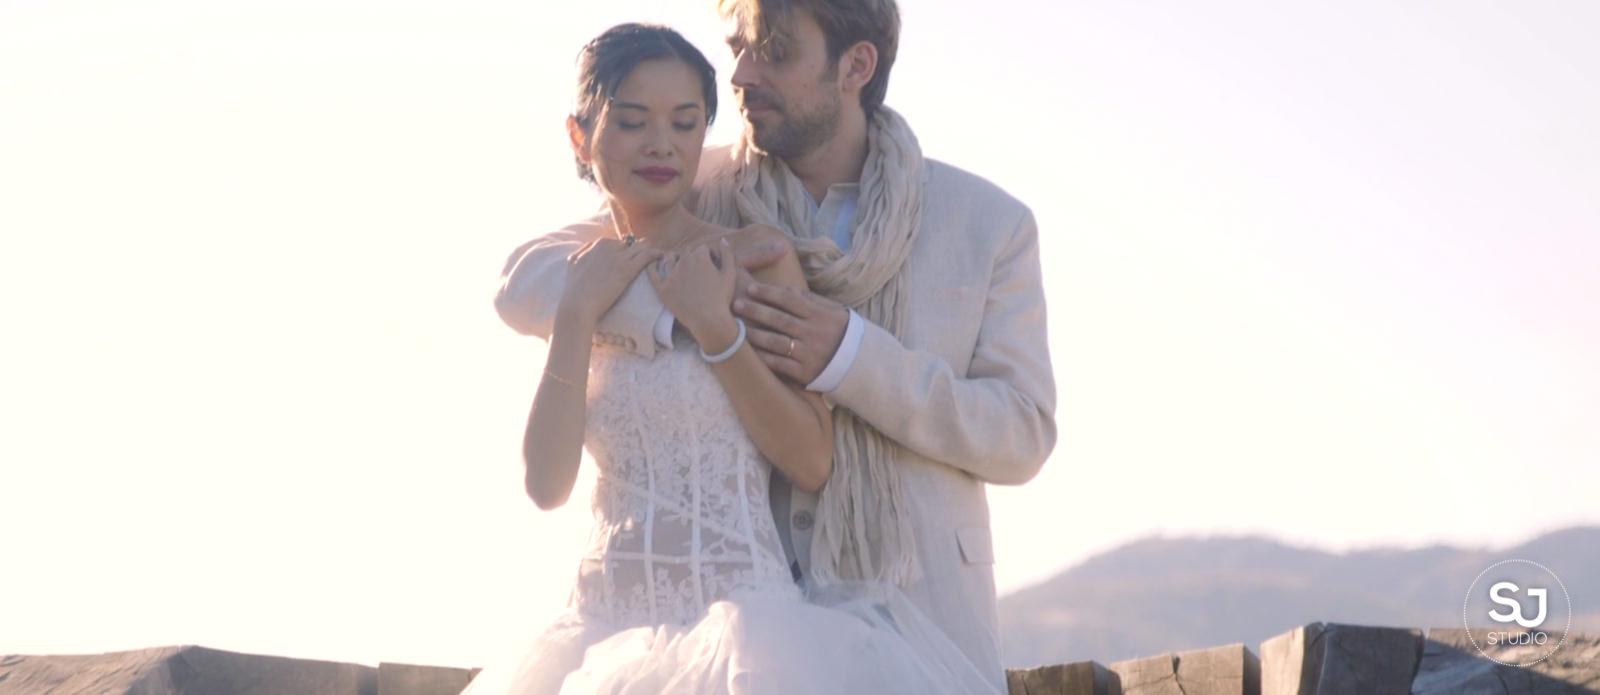 film-de-mariage-marseille-domaine-gros-driou-sj-studio-sebastien-cabanes-17